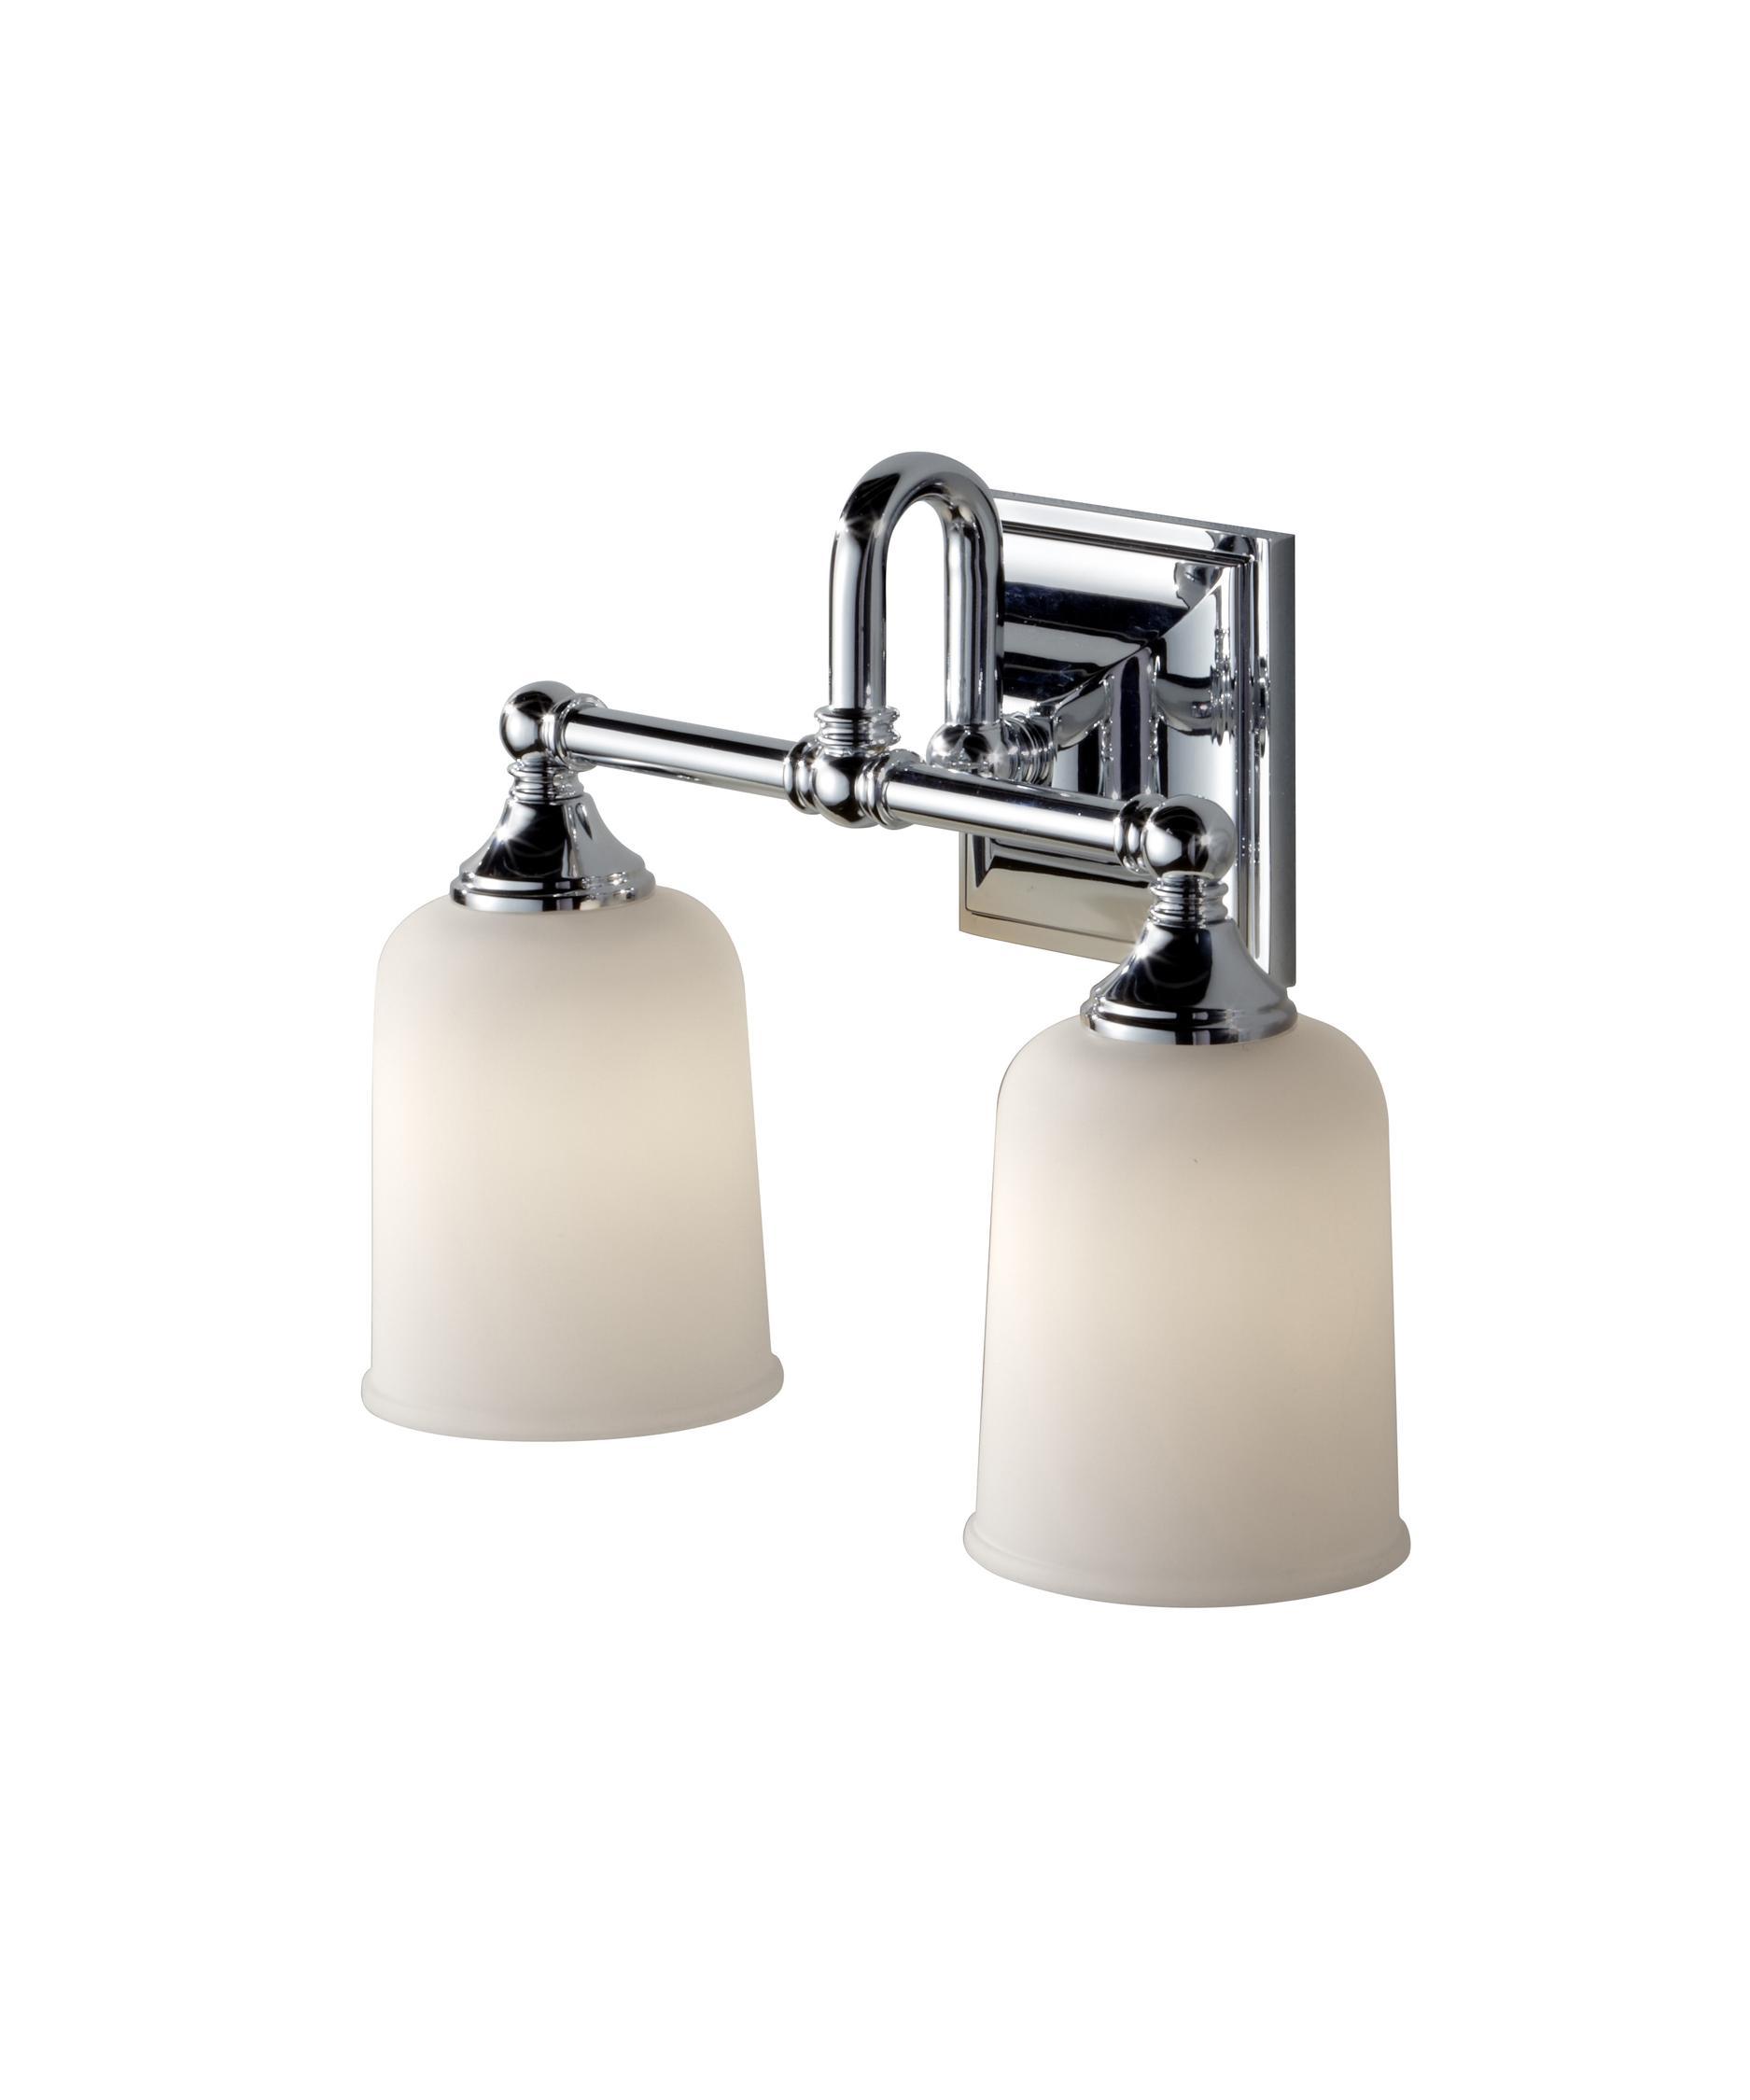 Murray Feiss VS Harvard 14 Inch Wide Bath Vanity Light